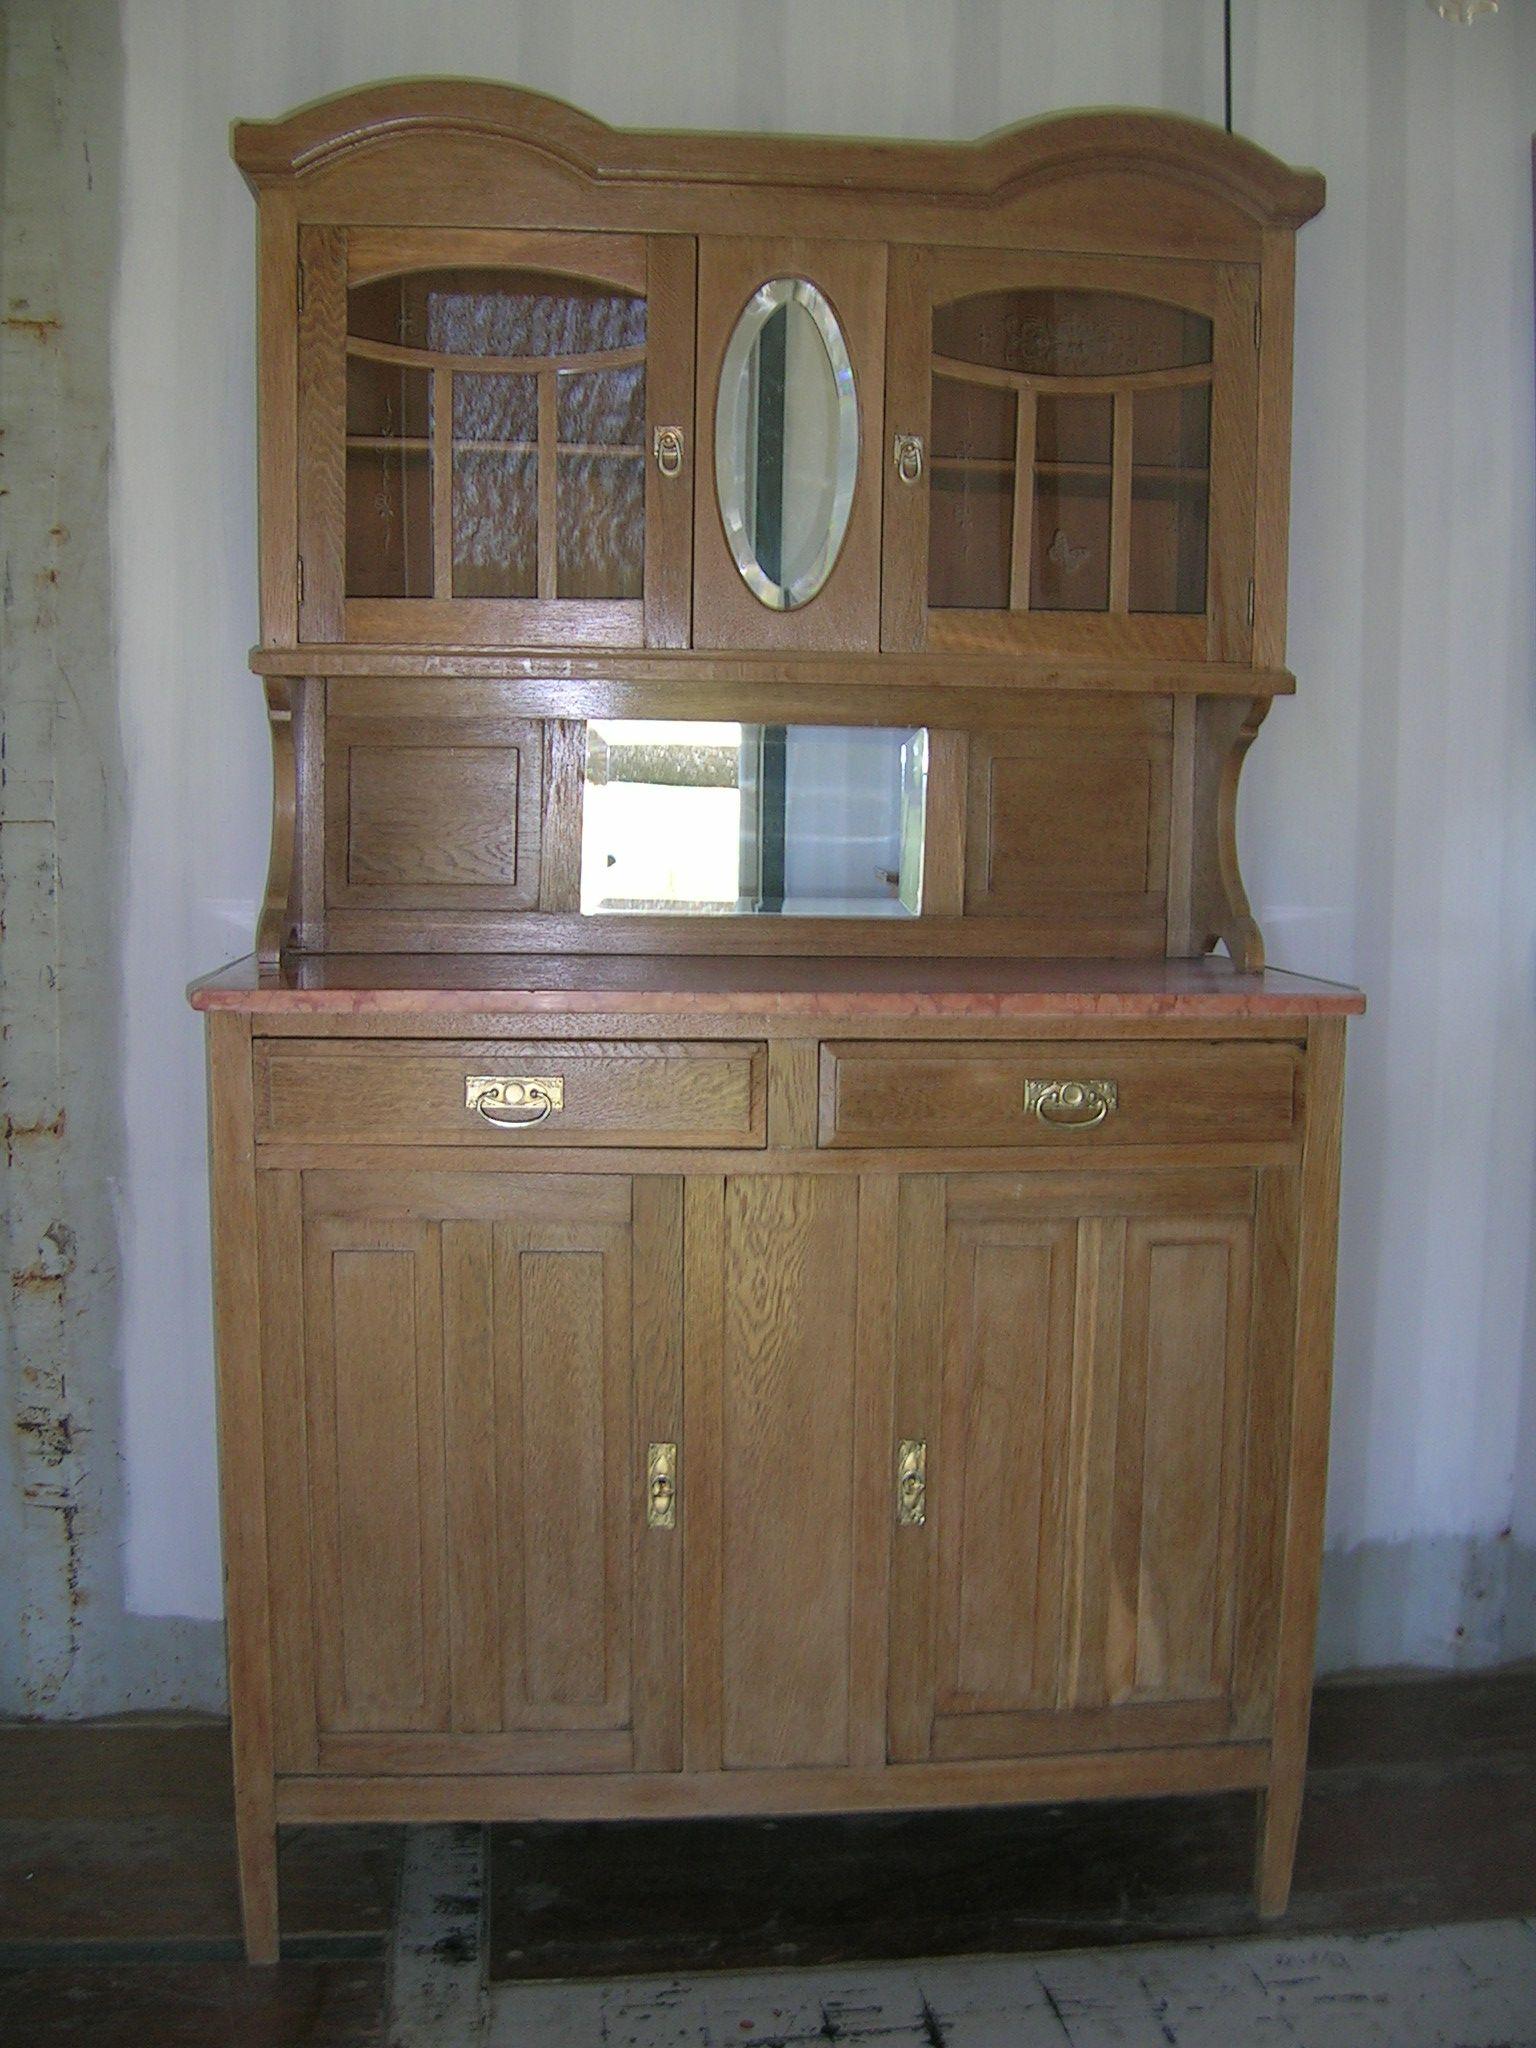 Aparador de roble muebles de campo restaurados pinterest for Muebles de campo